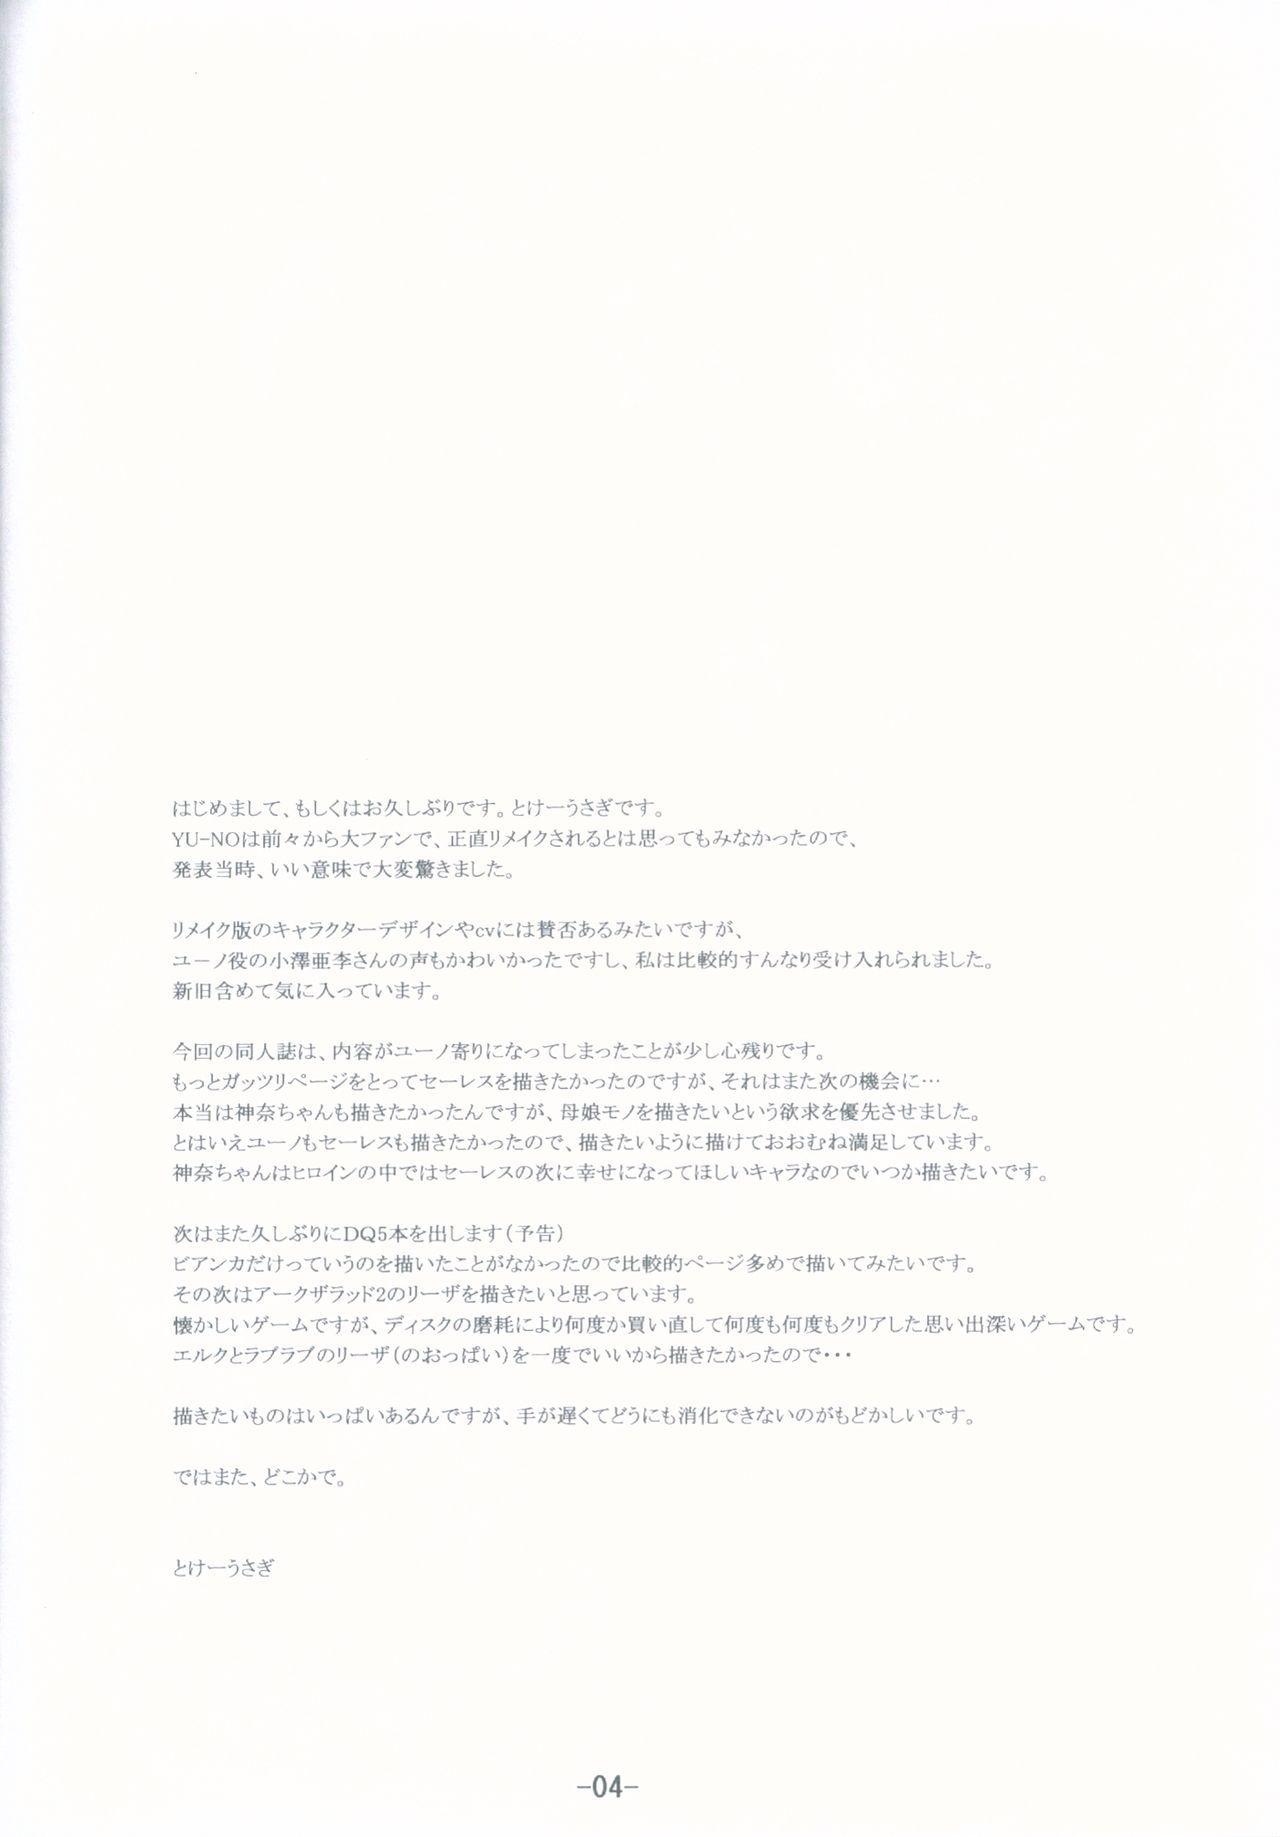 Isekai no Hanayome 3